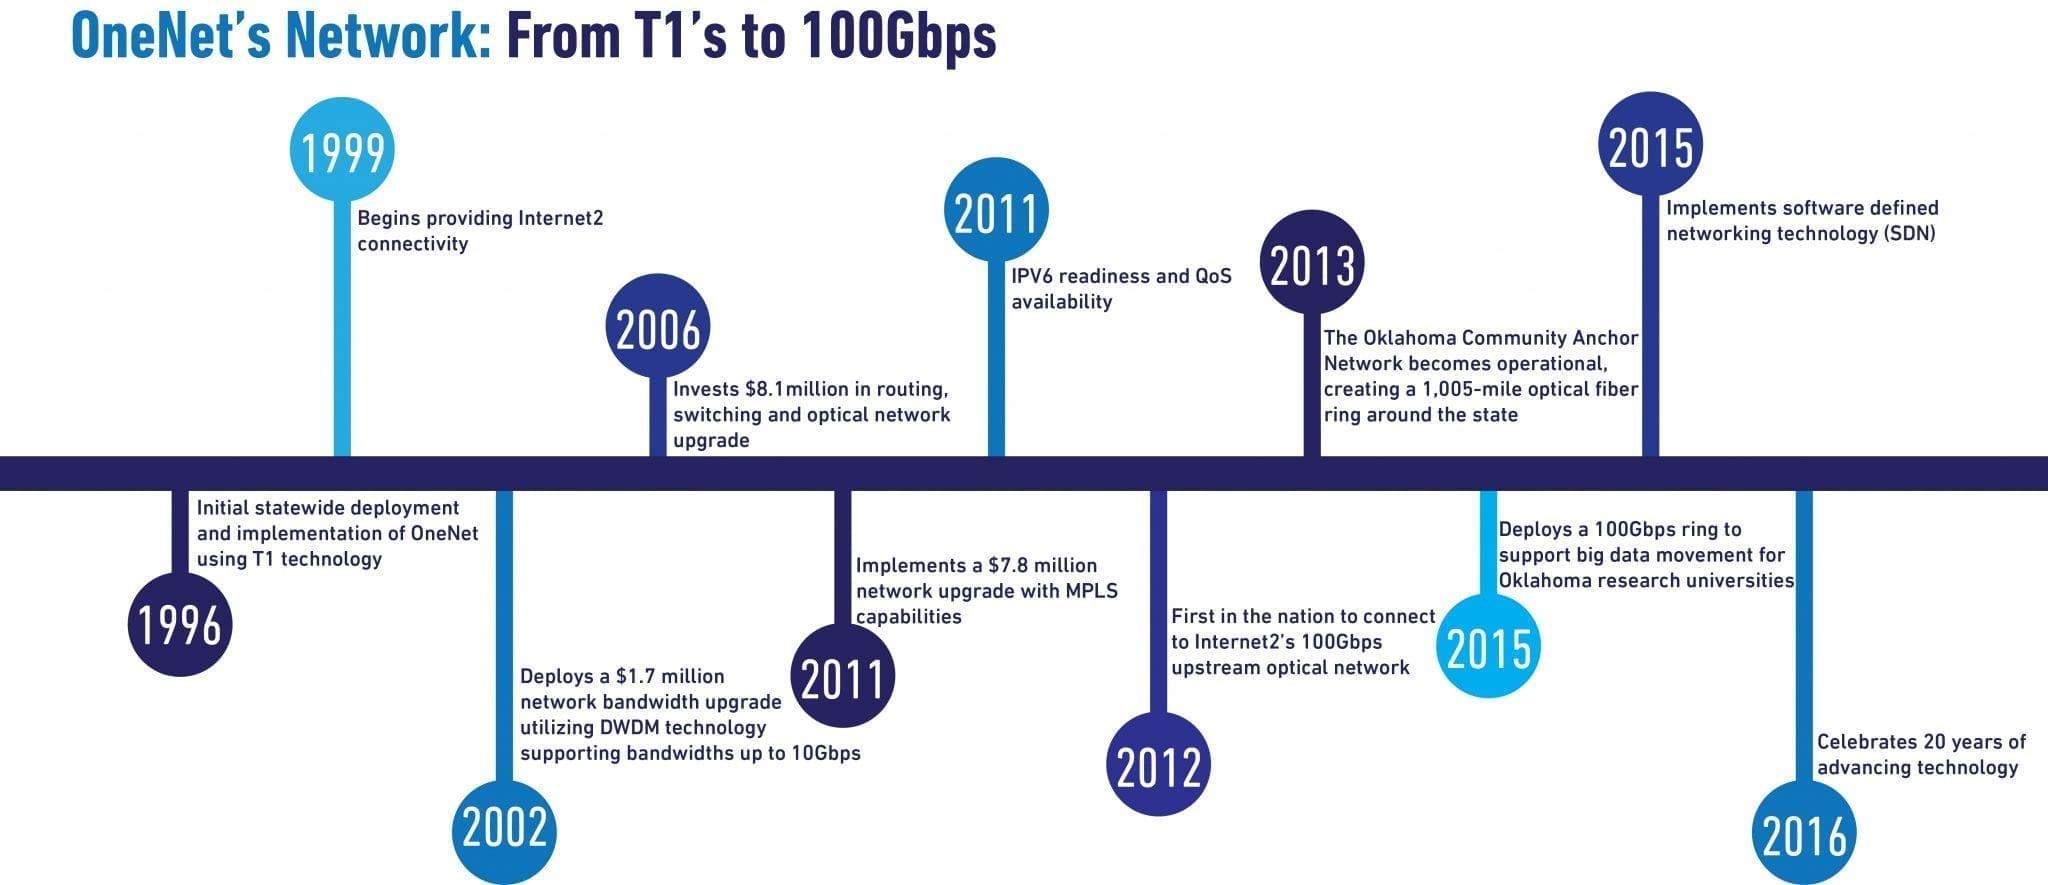 OneNet Timeline of Network Upgrades